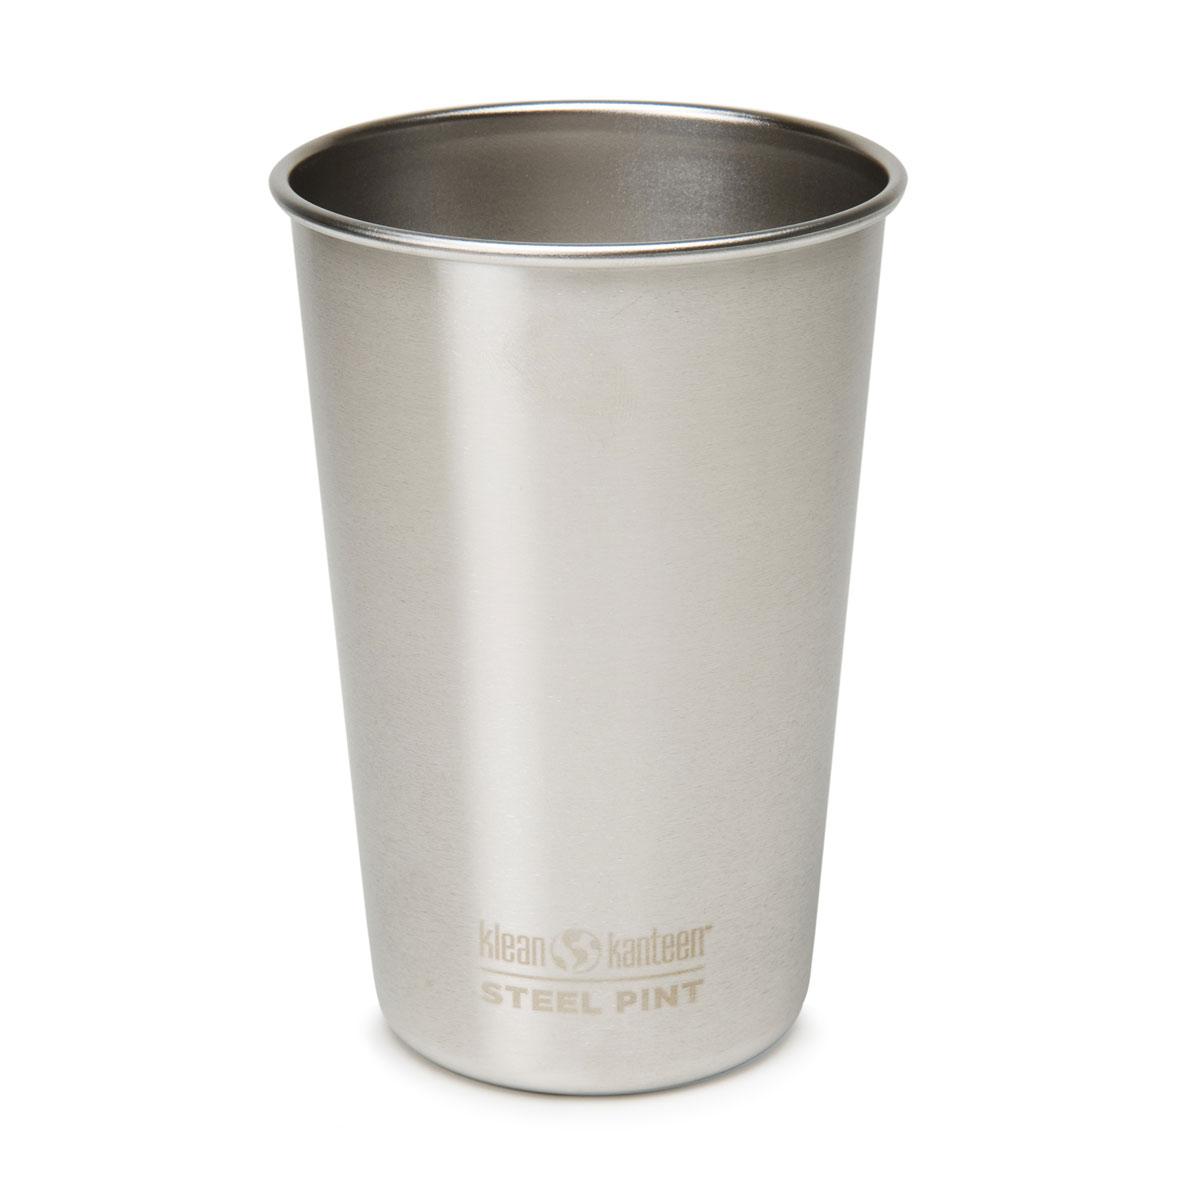 Klean Kanteen Stainless Steel Pint Cup